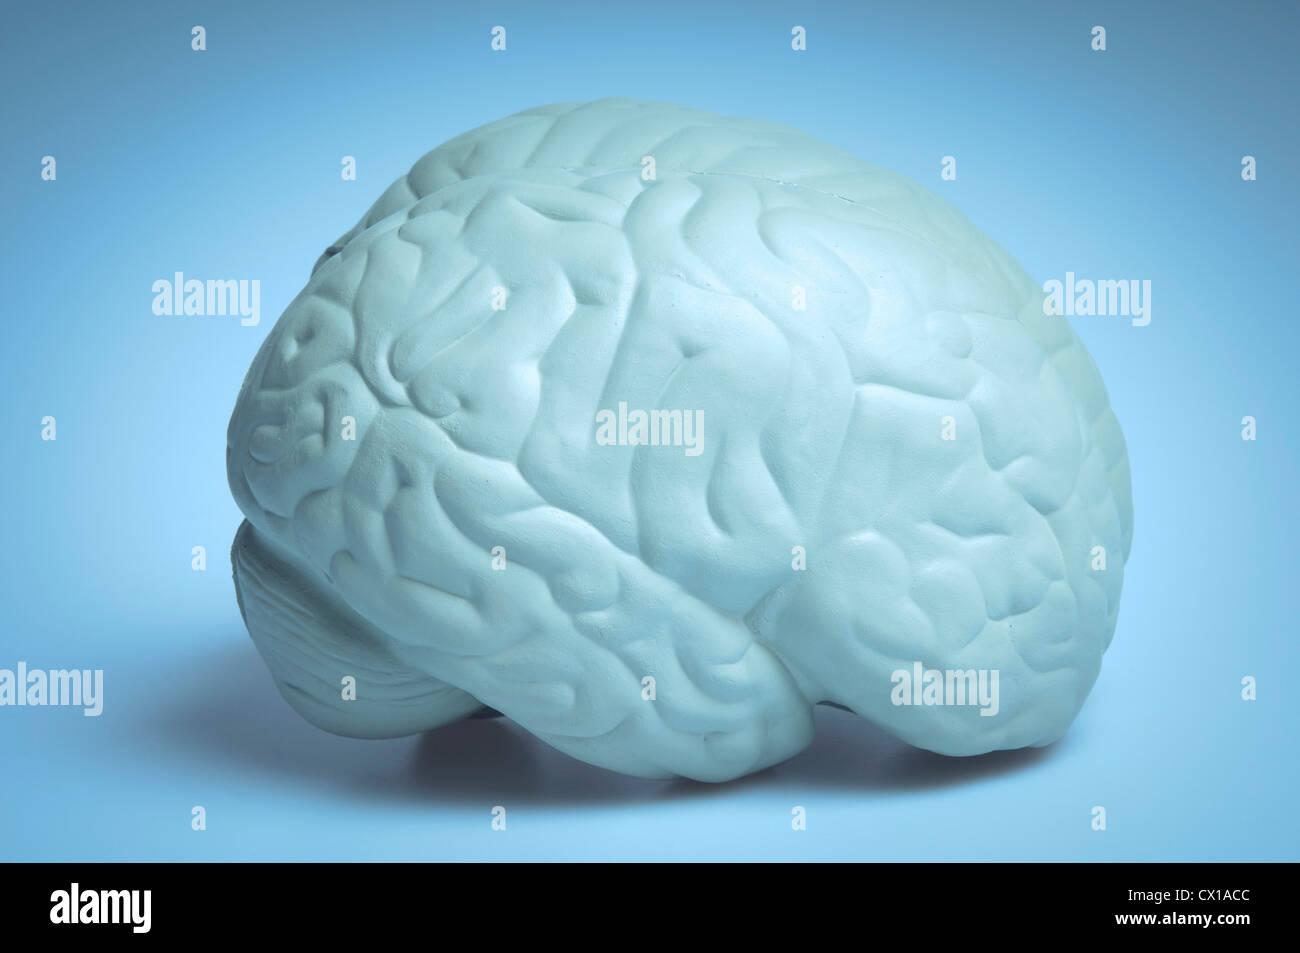 human brain plastic model - Stock Image